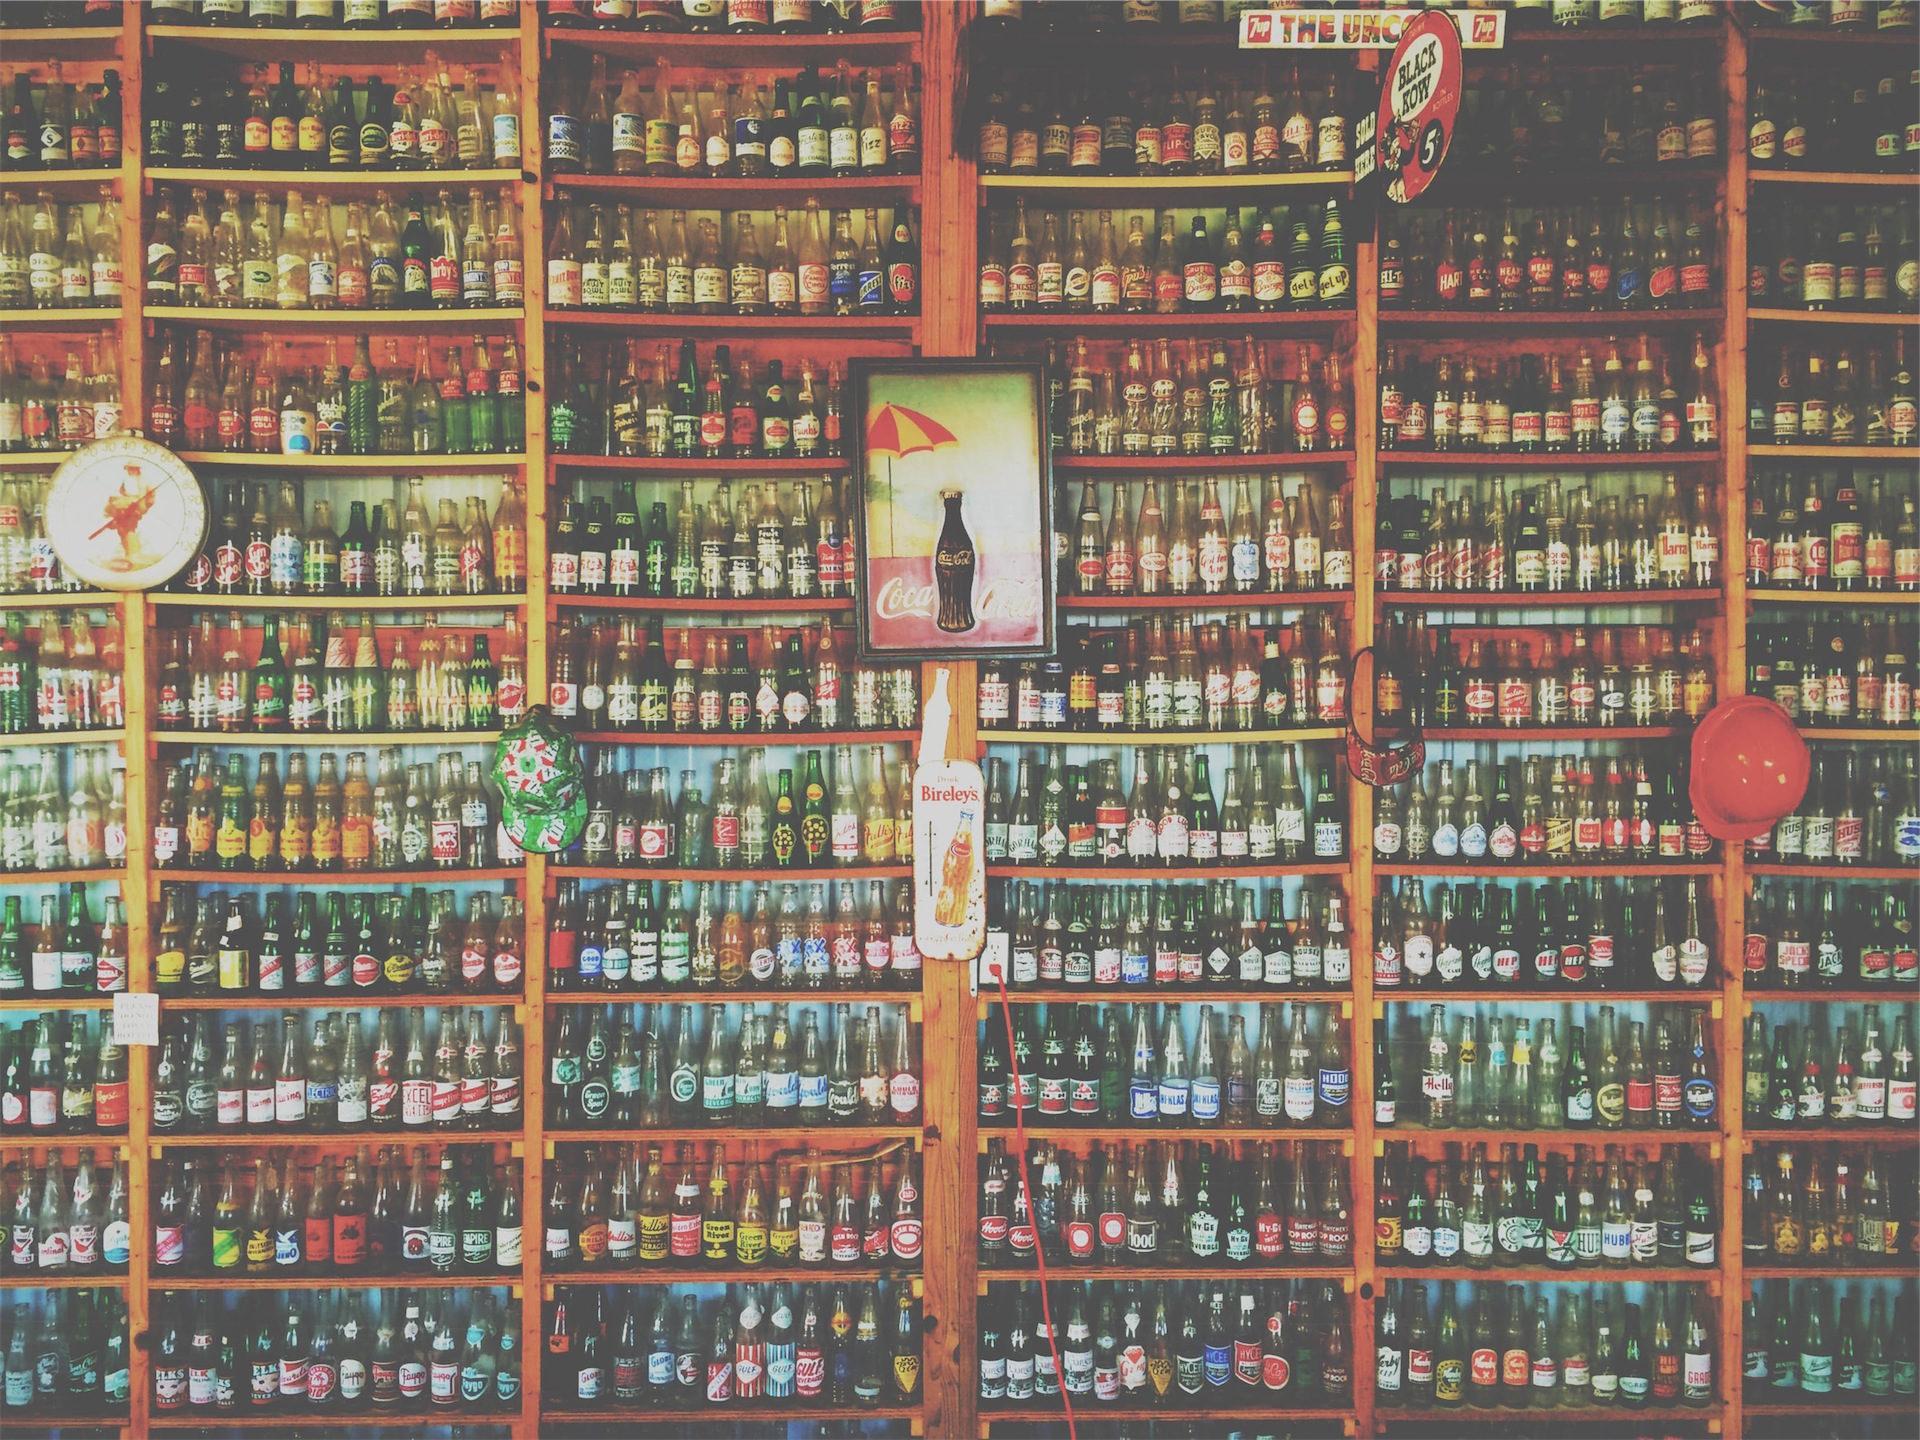 बोतलें, refrescos, बियर, estantería, संग्रह - HD वॉलपेपर - प्रोफेसर-falken.com